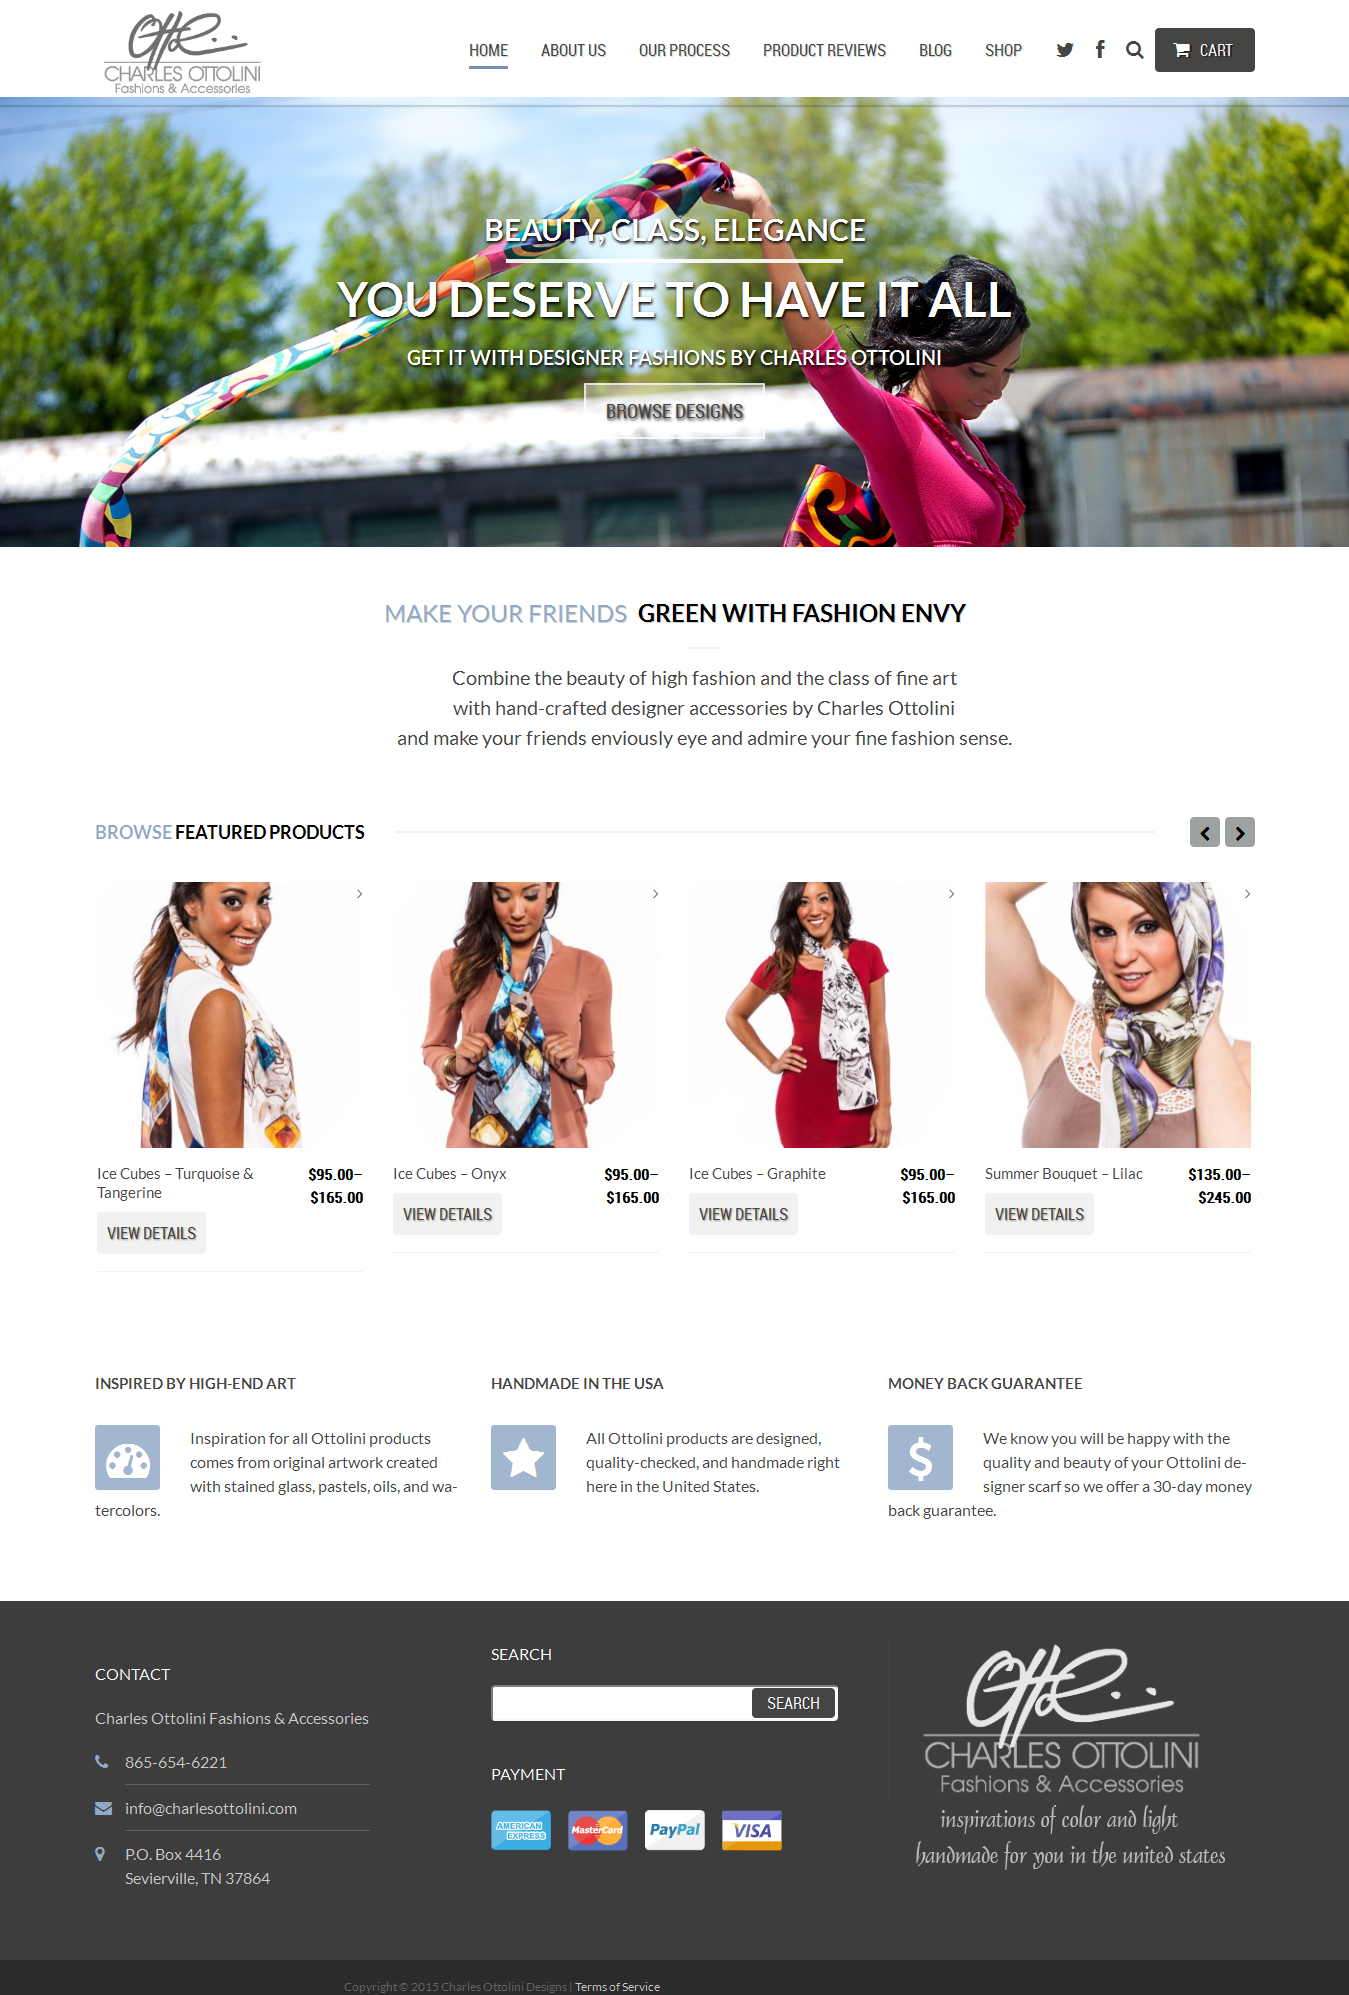 Charles Ottolini - Designer Fashions & Accessories 2015-11-17 13-56-38